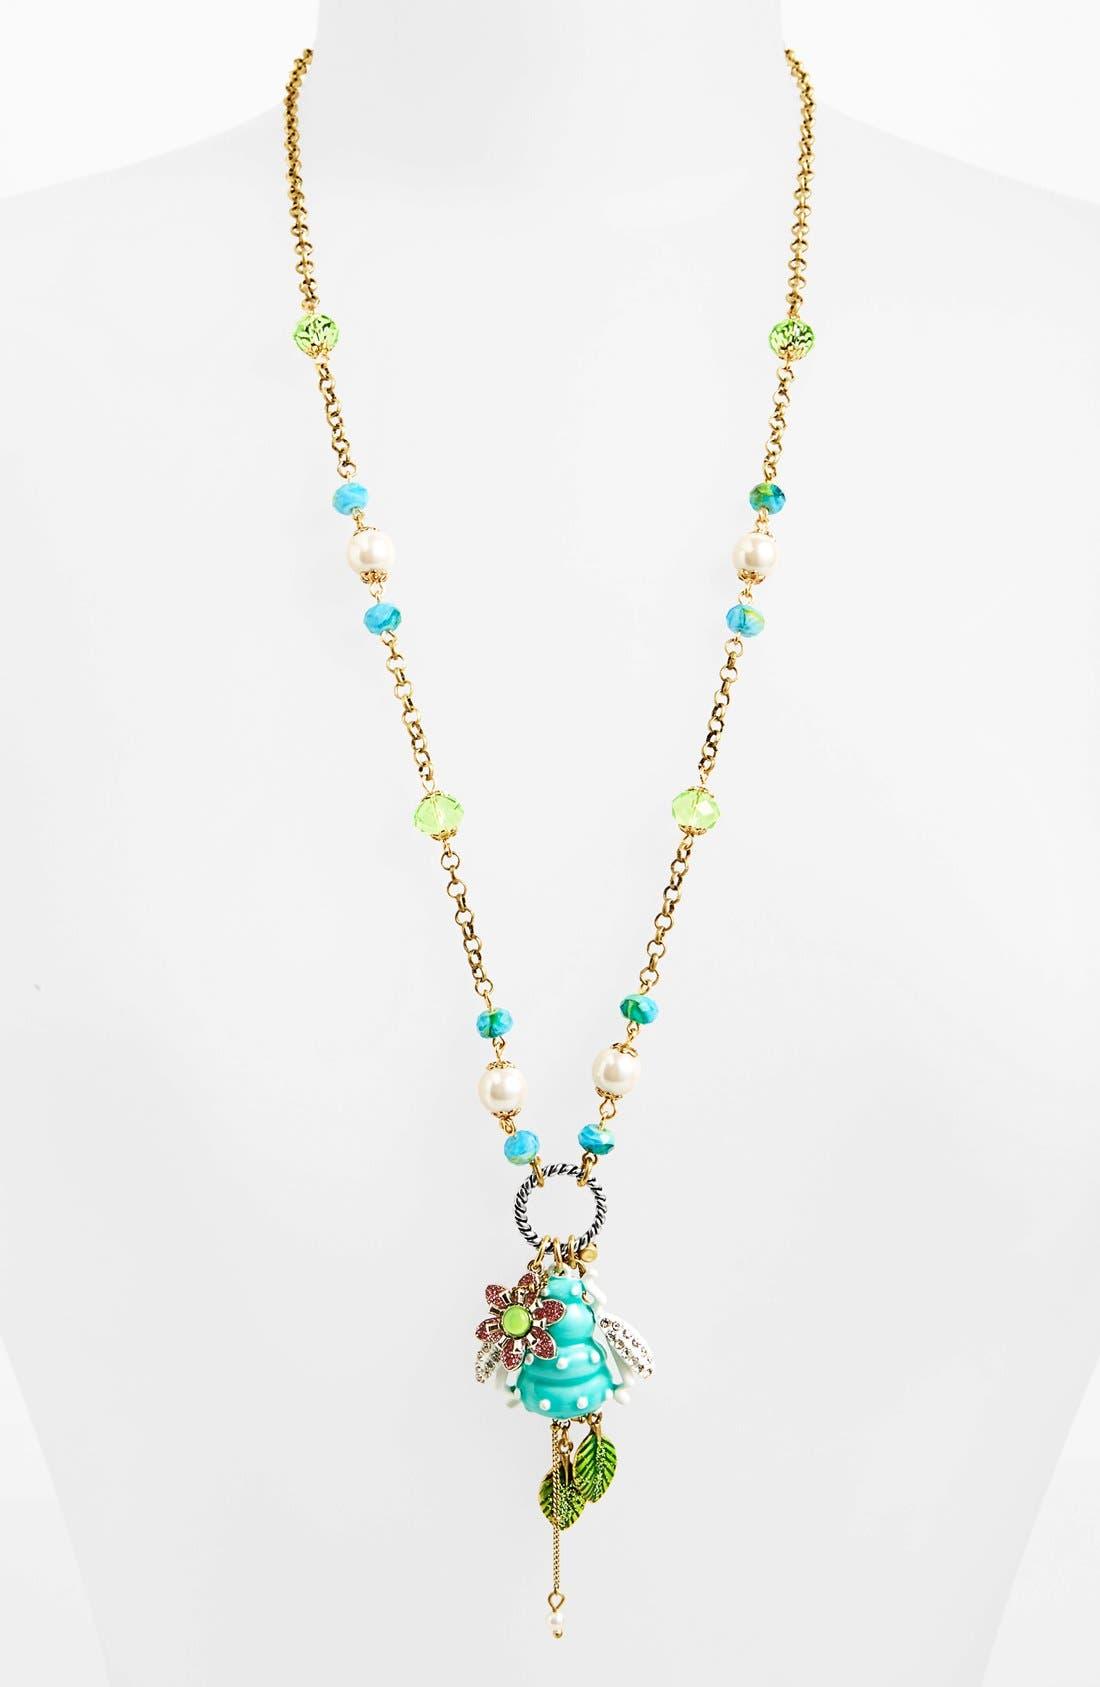 Main Image - Betsey Johnson 'Vintage Bugs' Long Pendant Necklace